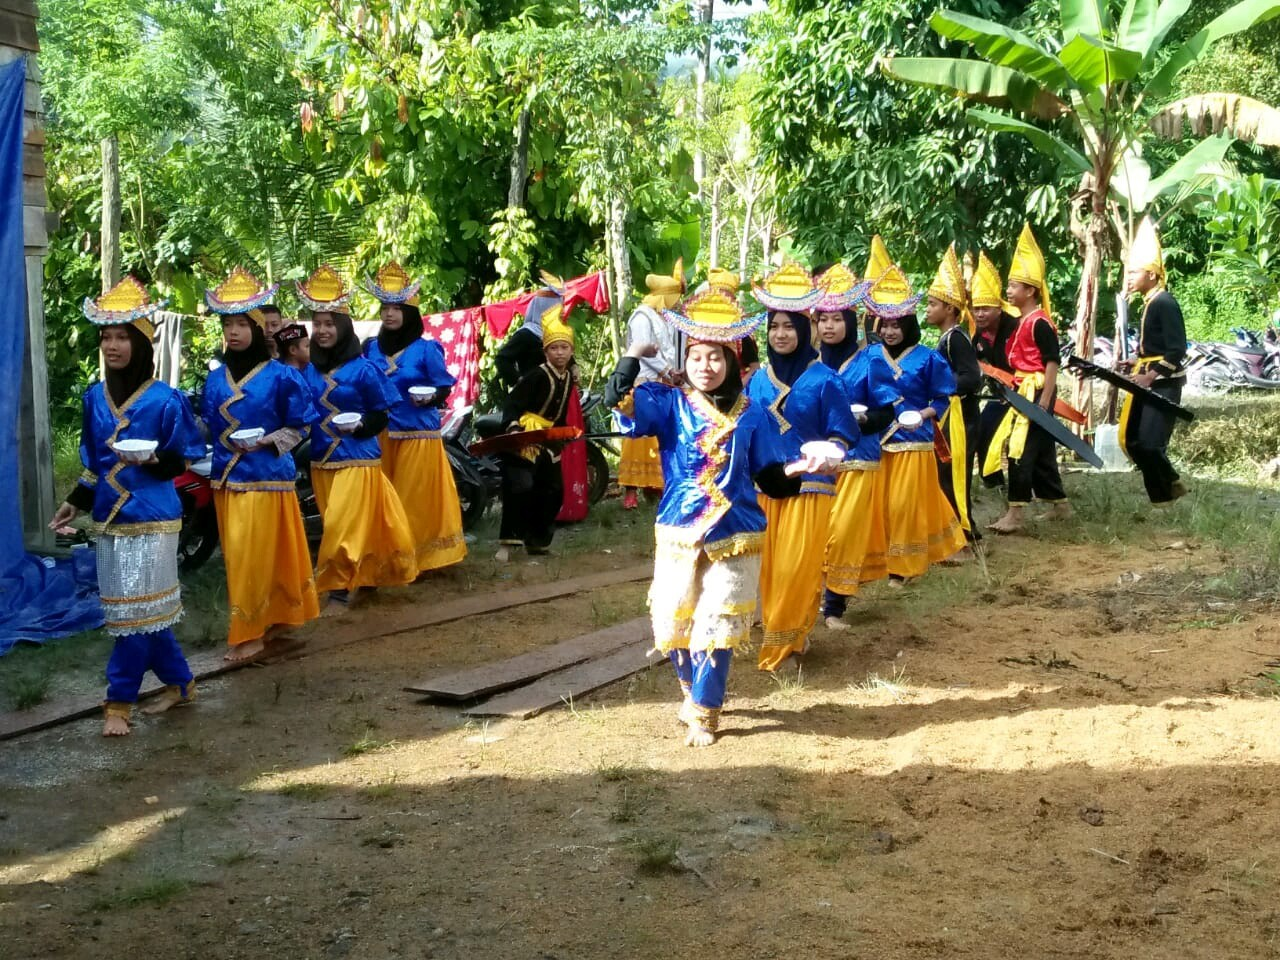 Suguhan Tarian Moriringgo dari Suku To Padoe dalam Pesta Panen Padungku di Desa Manurung Luwu Timur